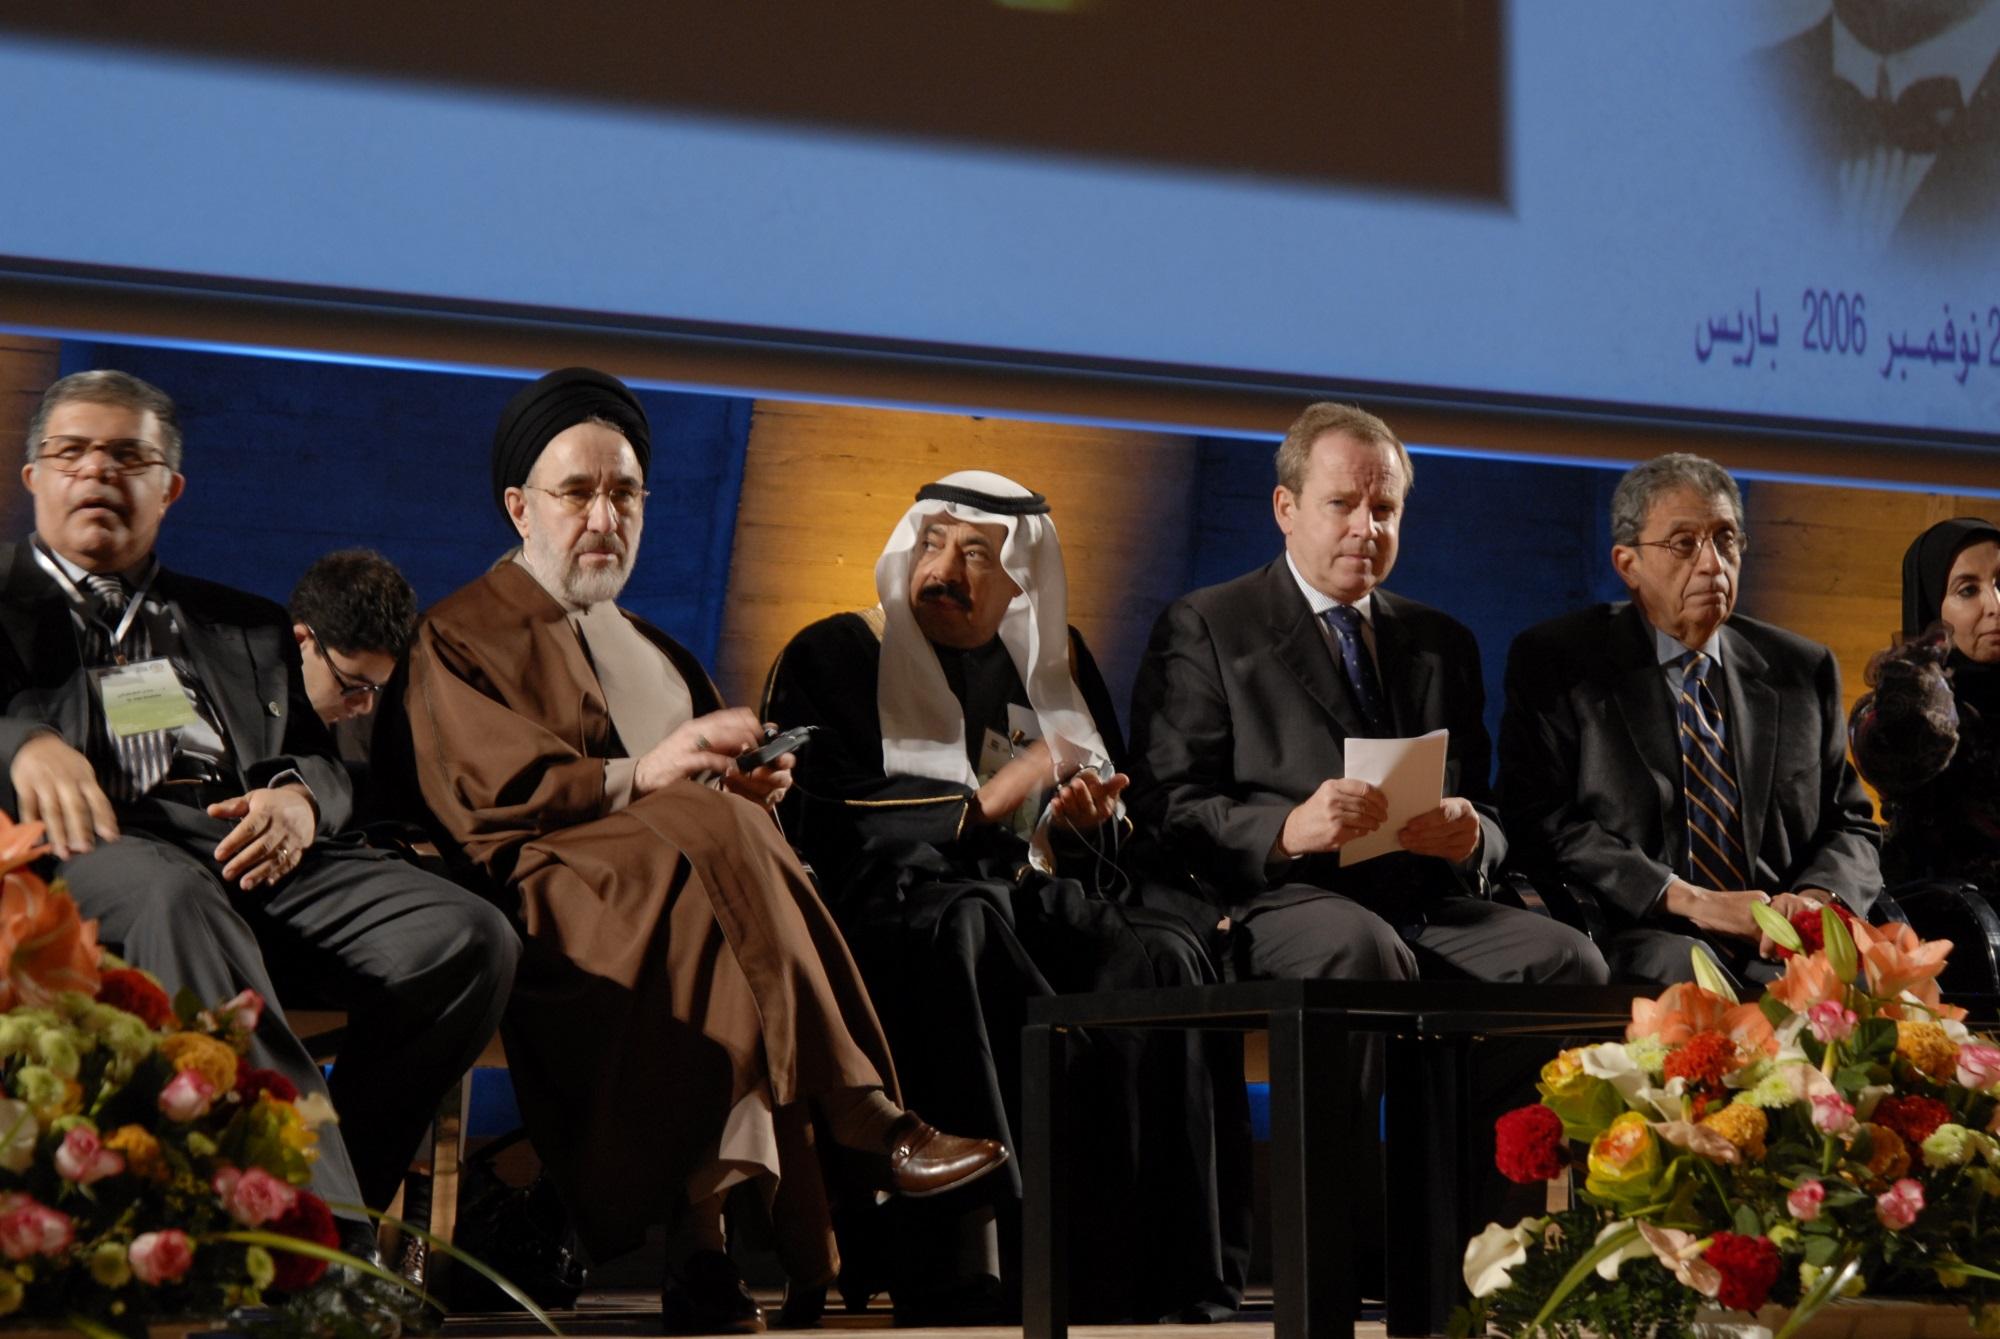 دورة شوقي ولامارتين 2006 باريس